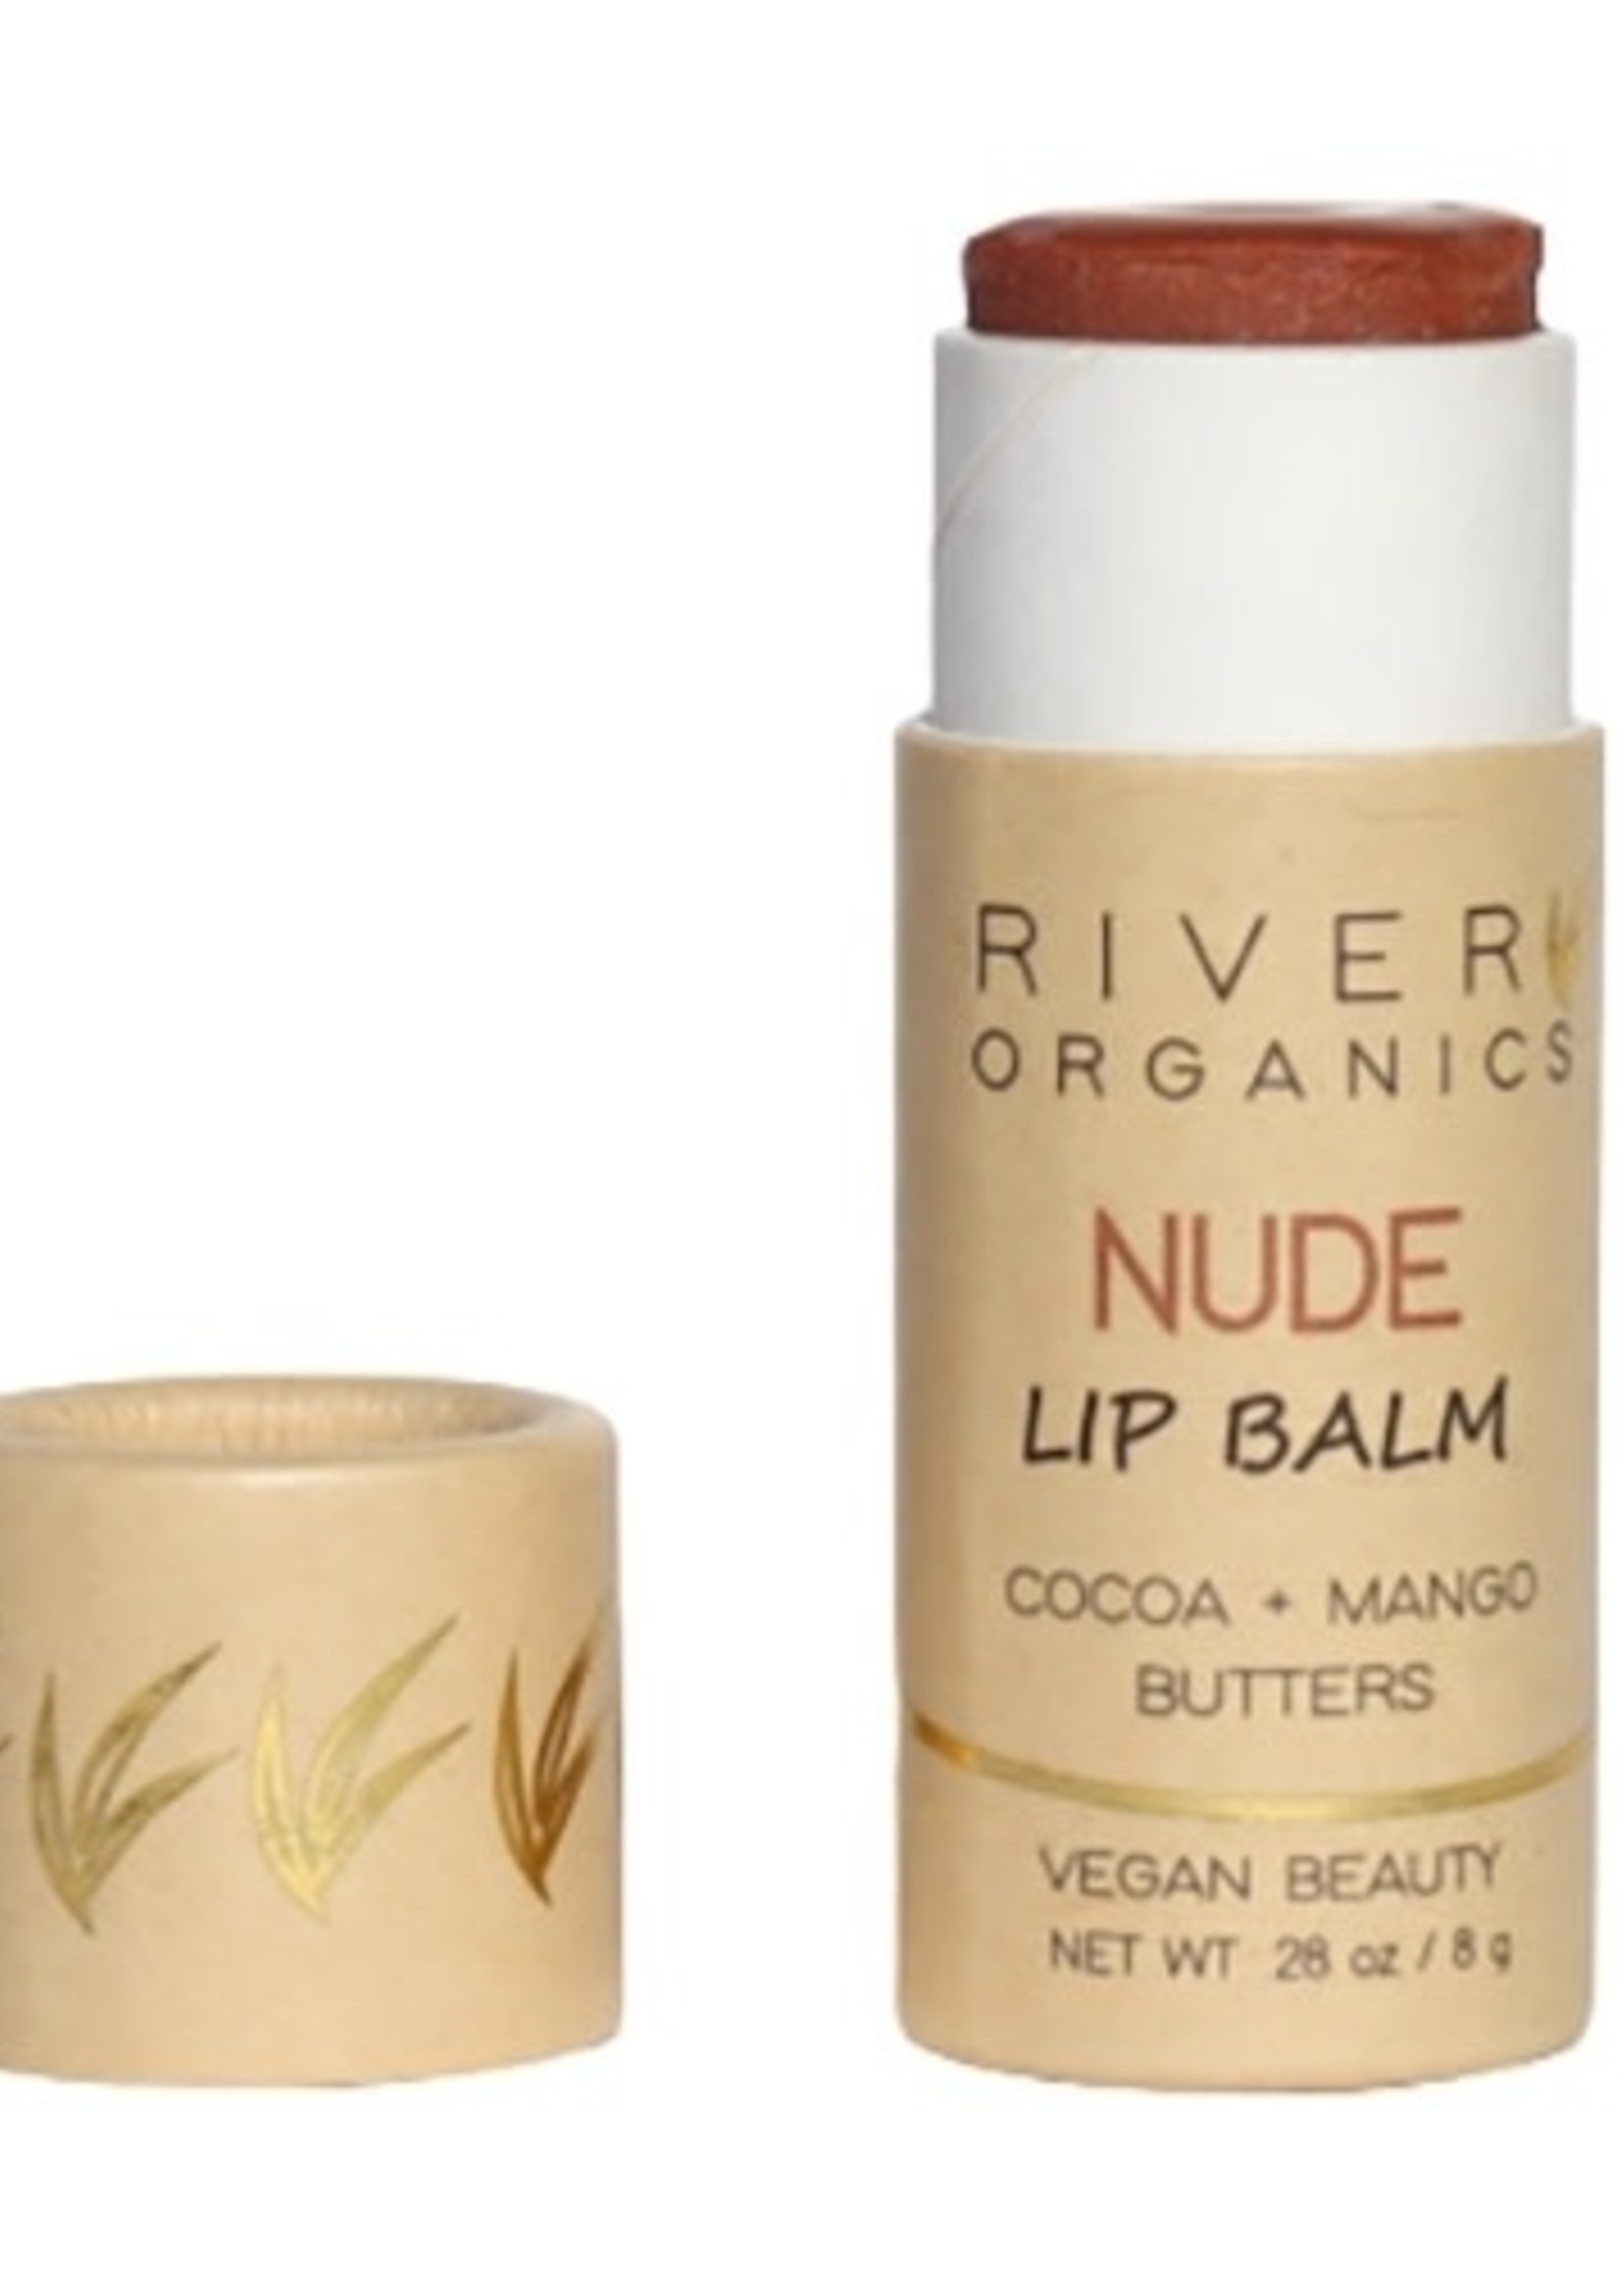 River Organics Nude Vegan Lip Balm